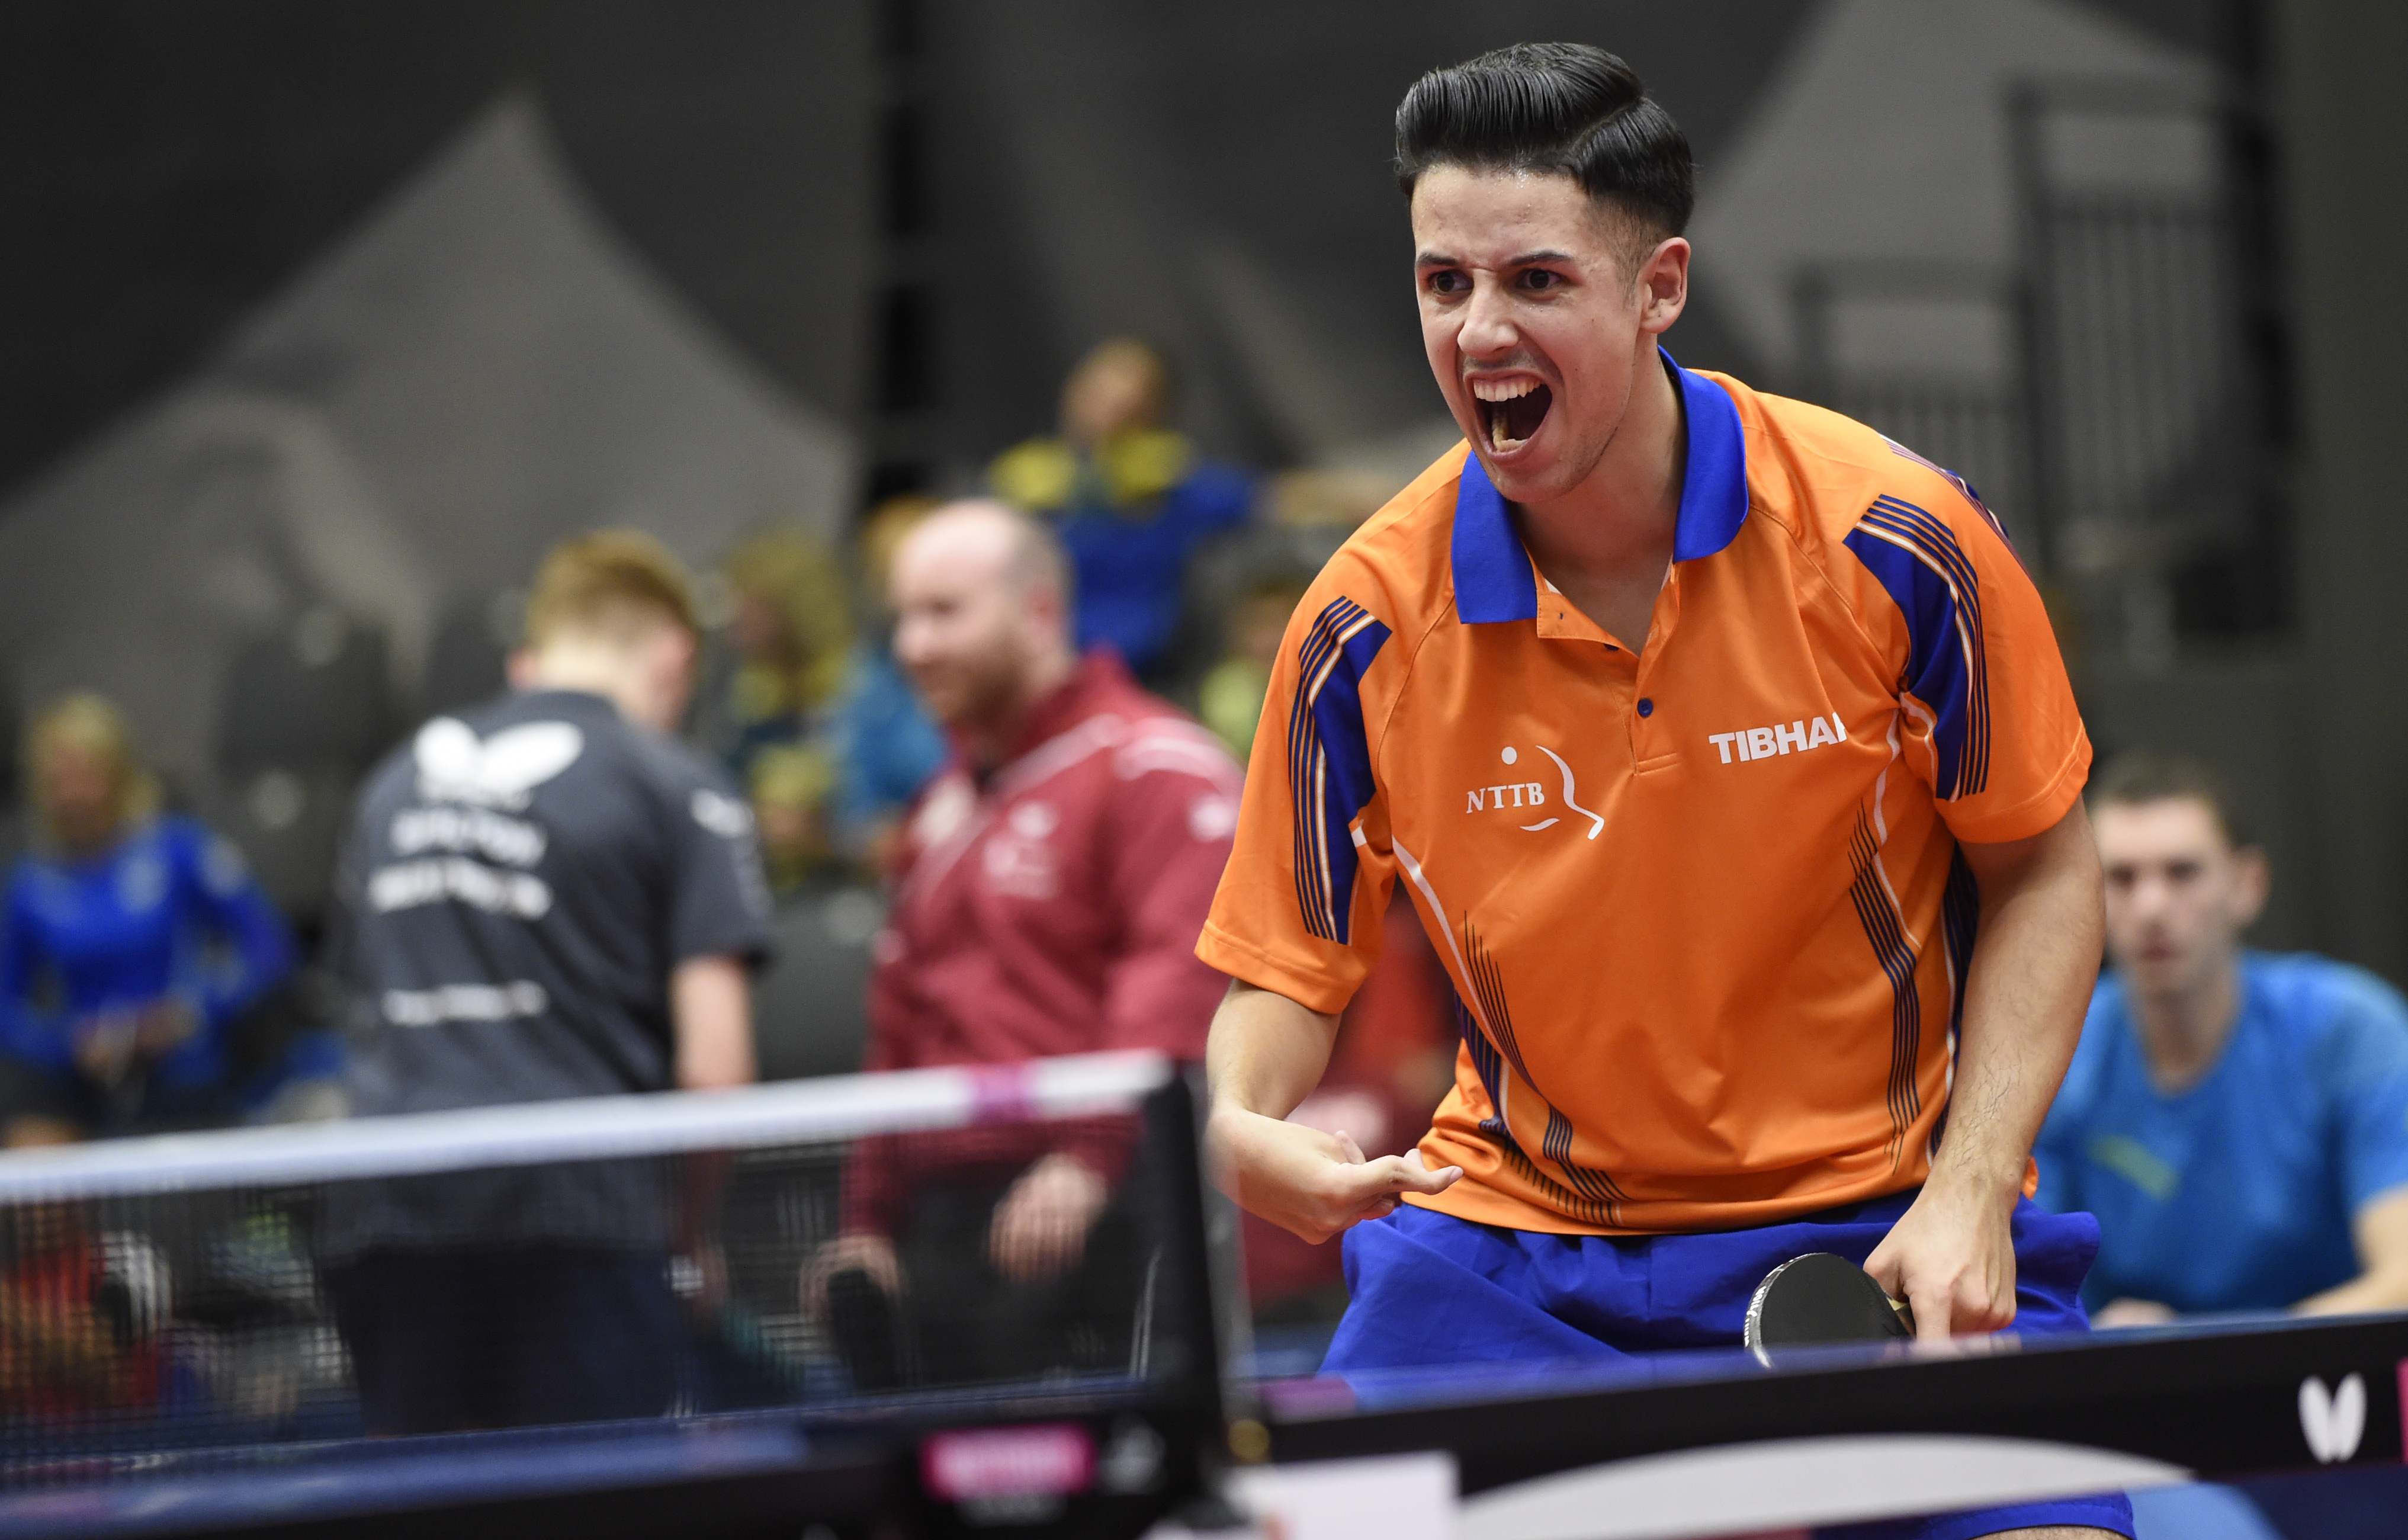 Tsjizjov voor de eerste keer europees kampioen.